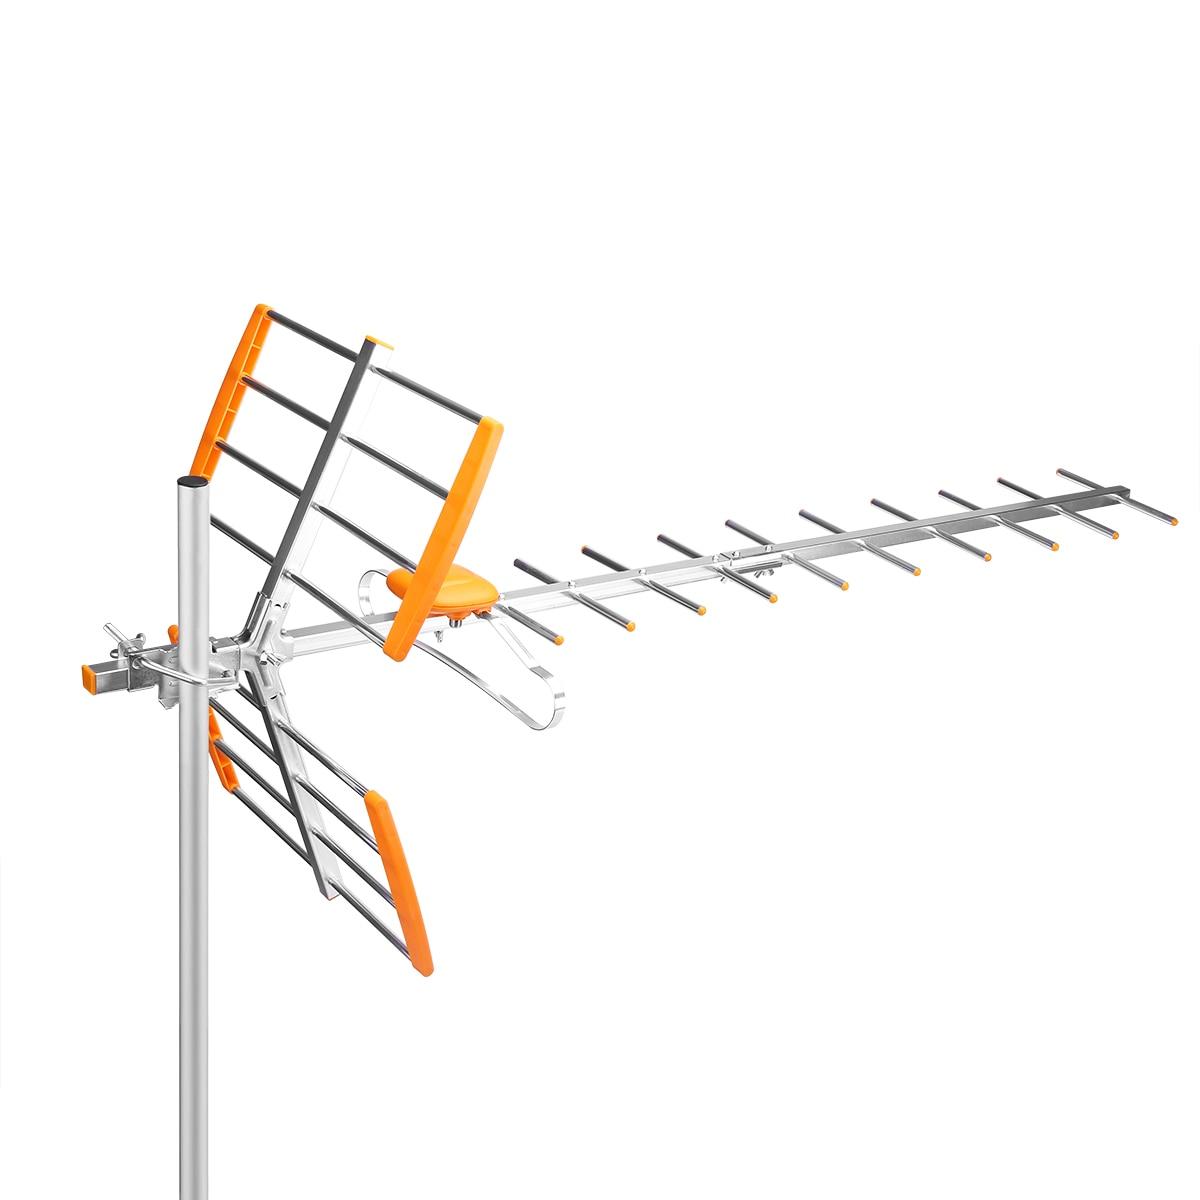 Antena exterior de alta ganancia HDTV de 80 millas, rango de recepción de 470MHz-860MHz, antena Digital amplificada para exteriores/ático/techo